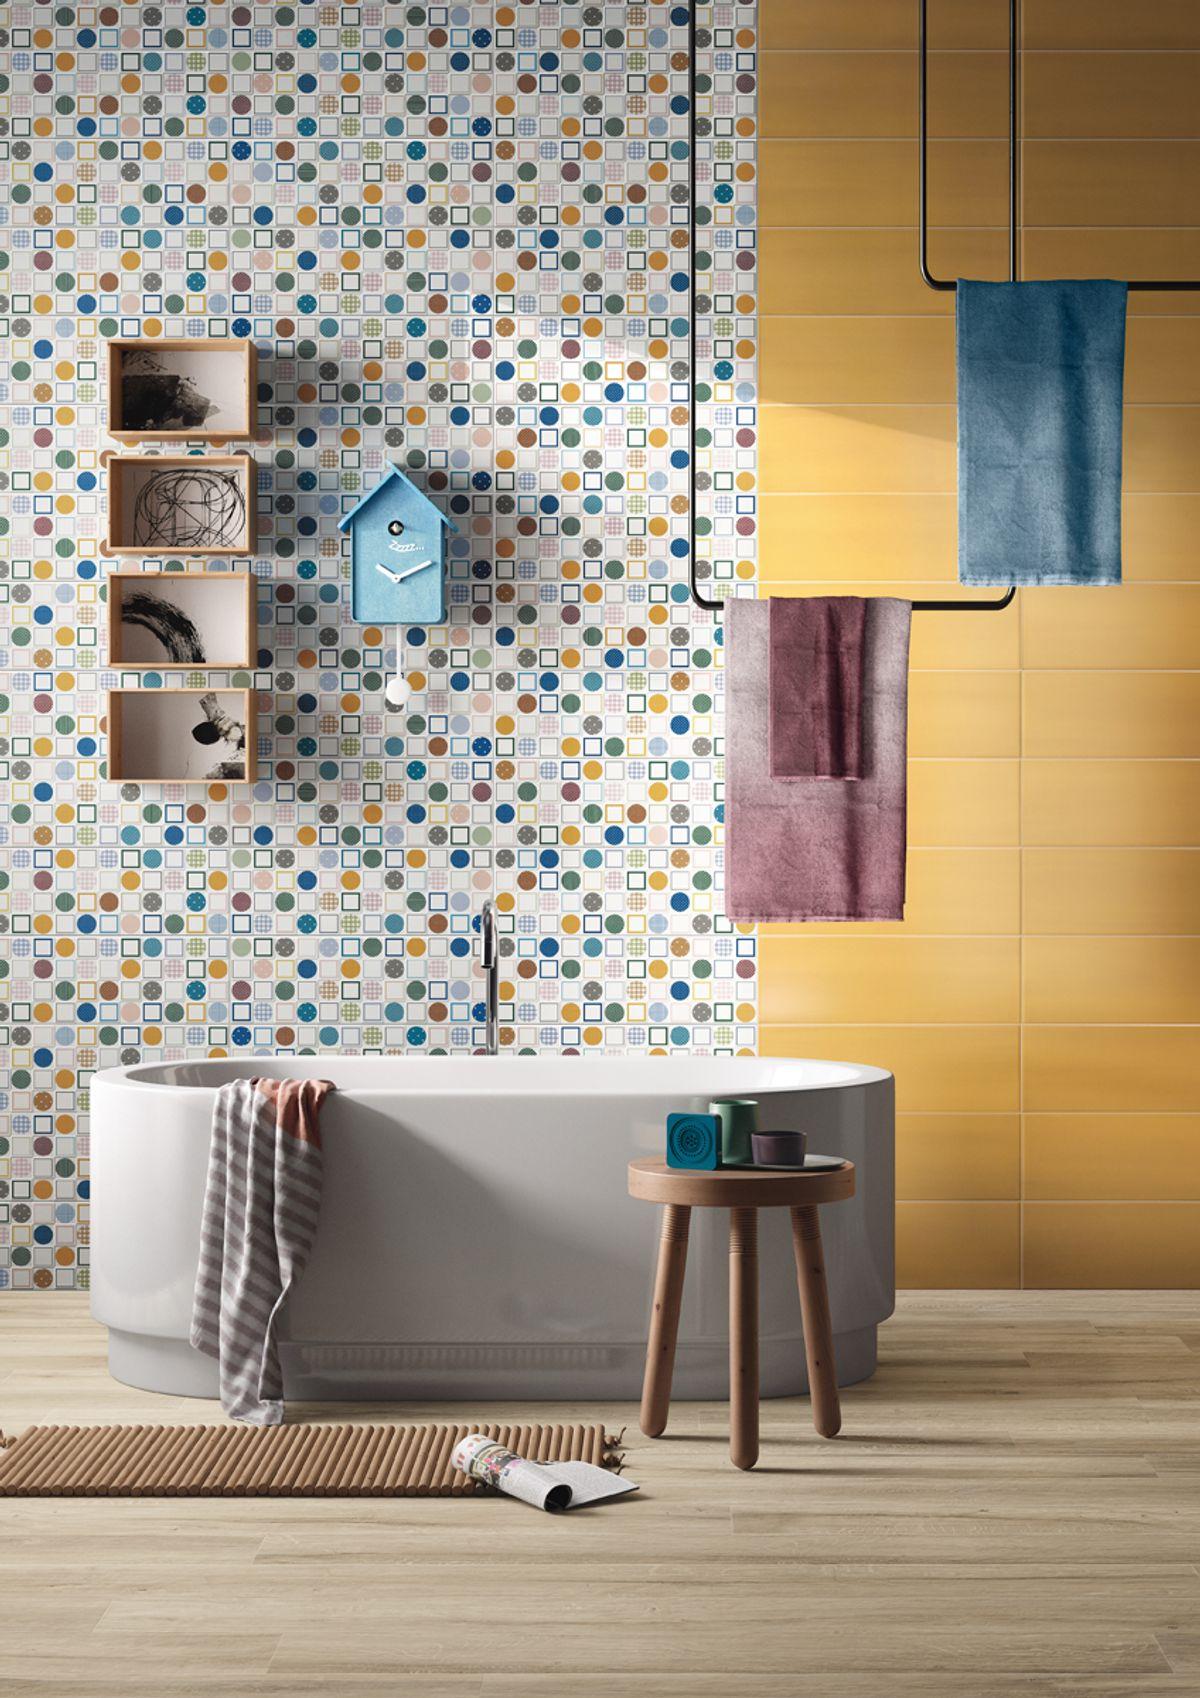 Salle De Bain Motif carrelage original motif salle de bain | idée salle de bain